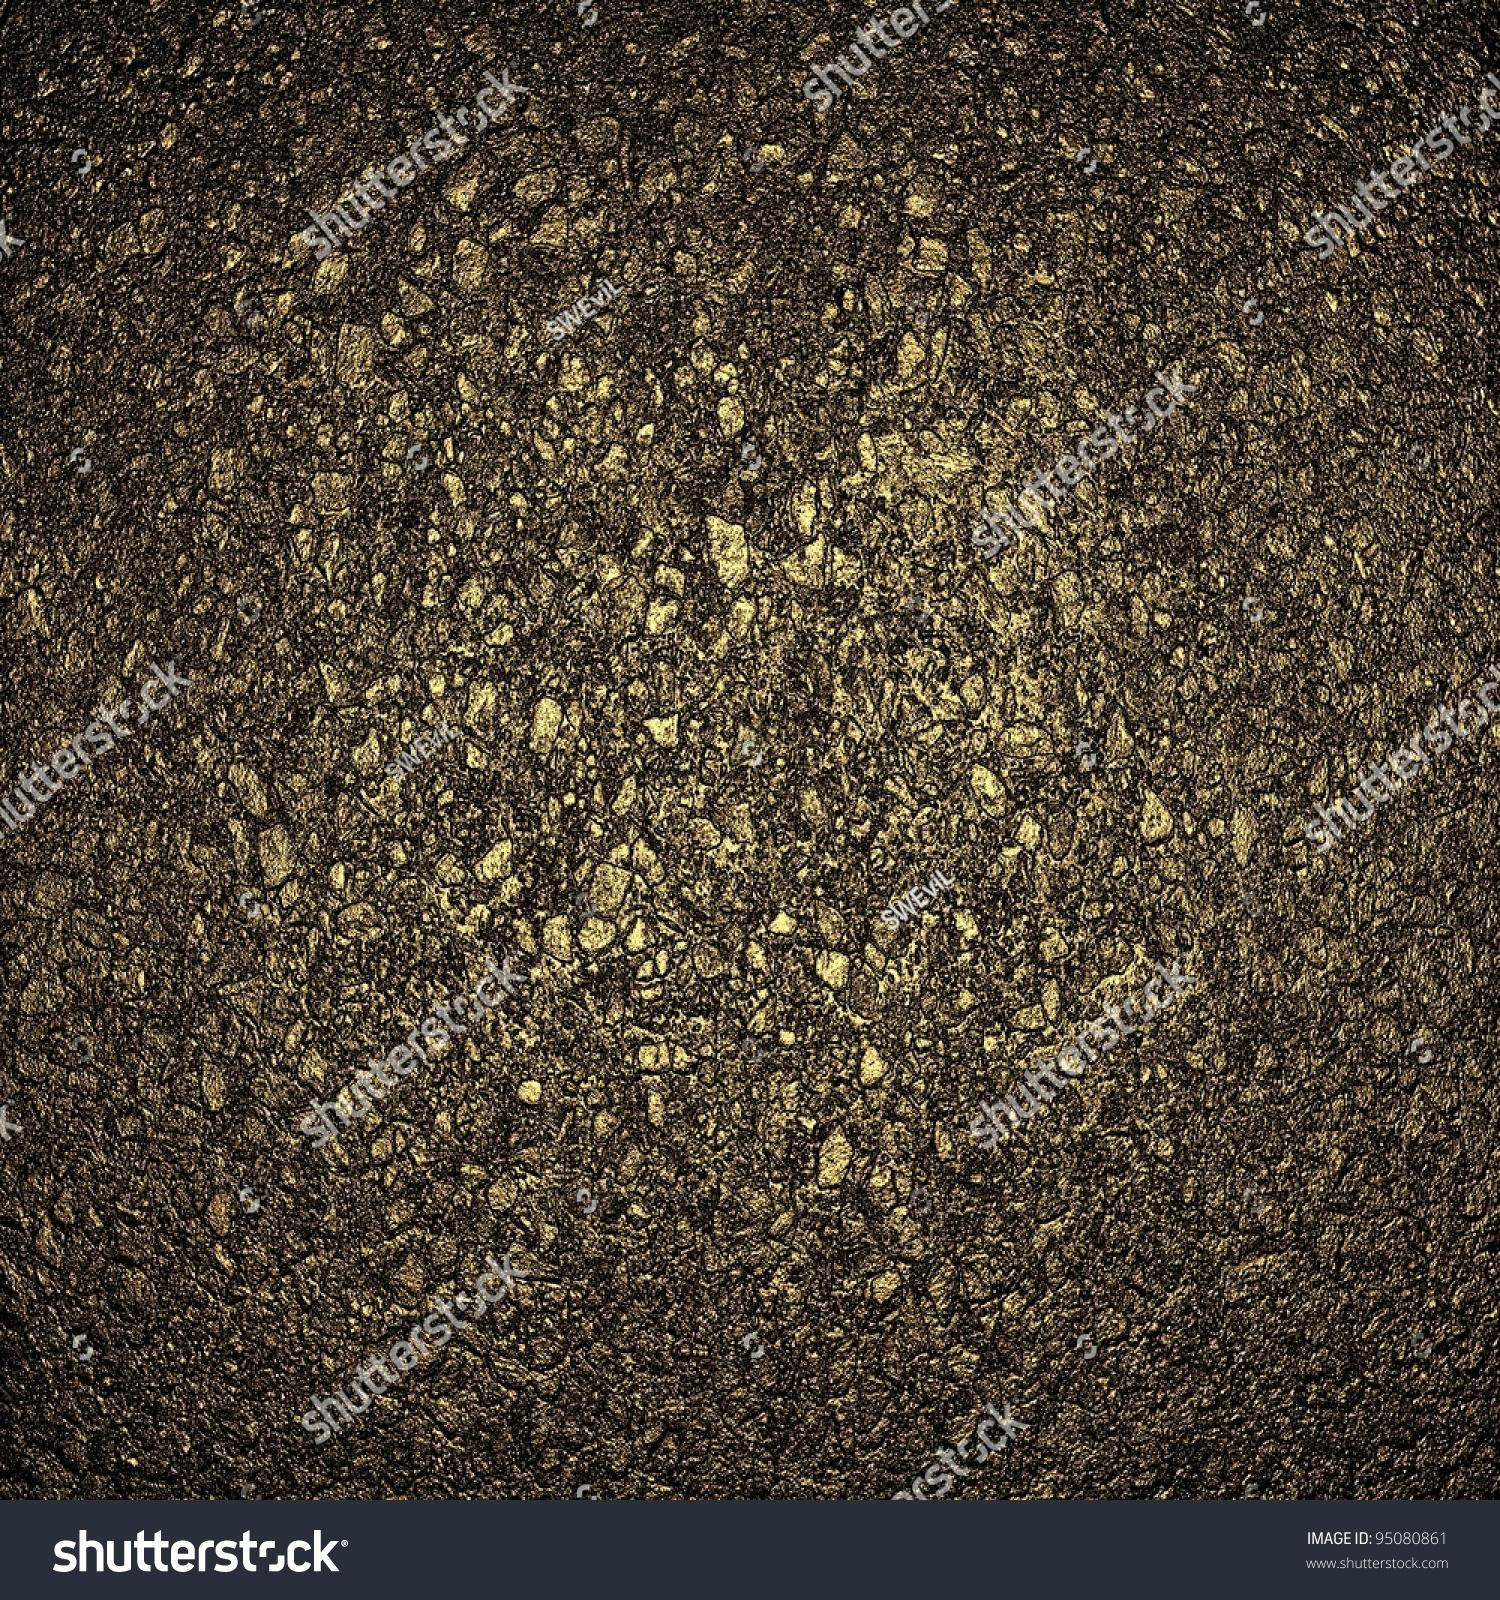 gold dust stock photo 95080861 shutterstock. Black Bedroom Furniture Sets. Home Design Ideas